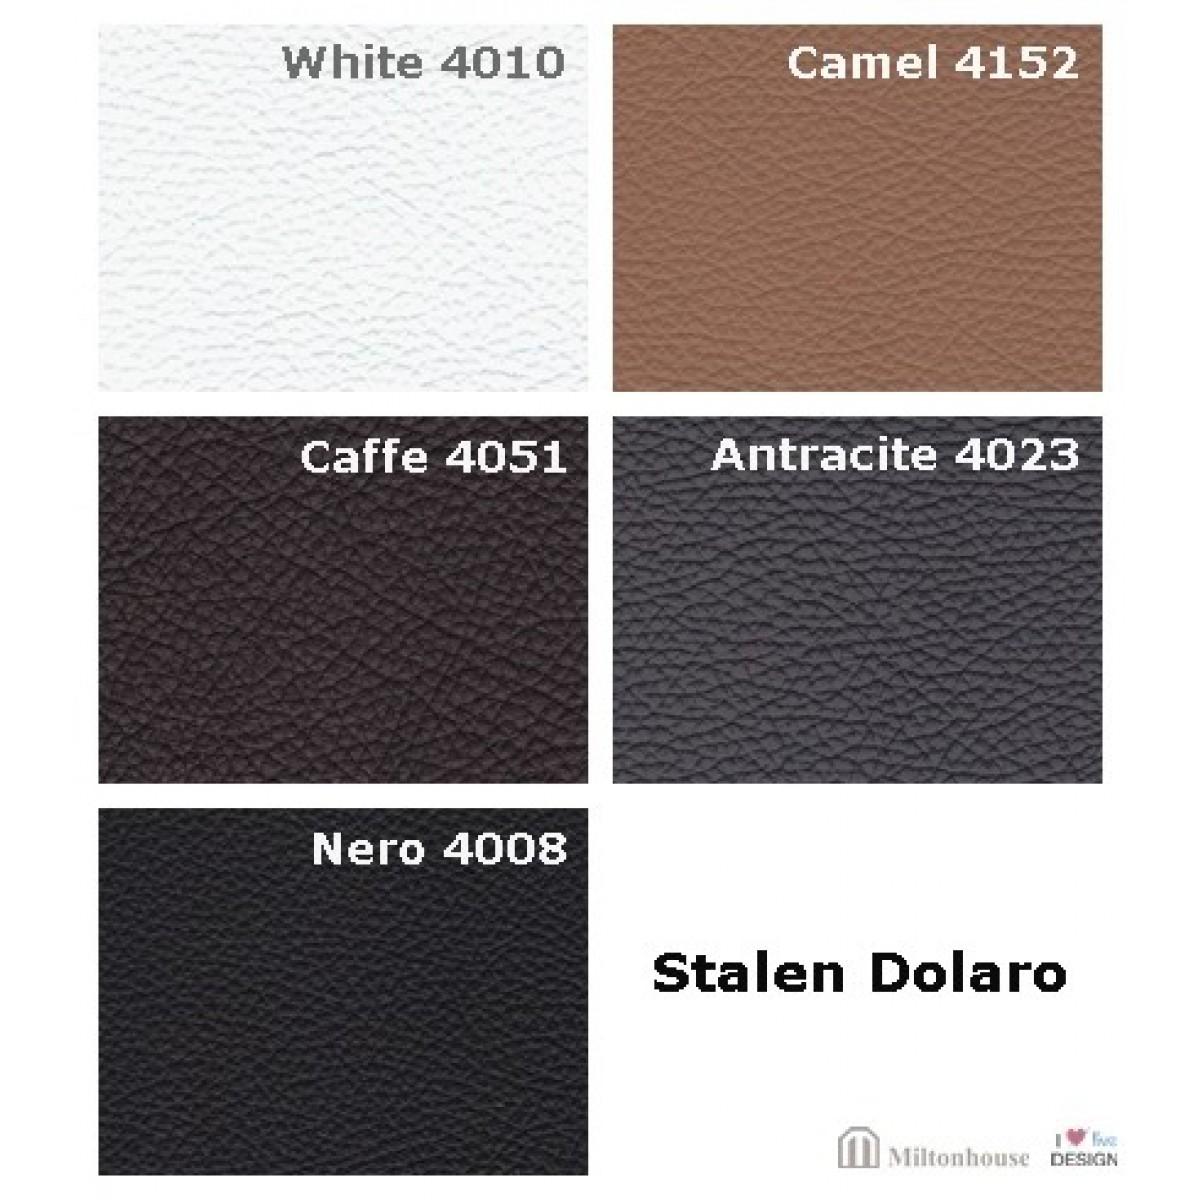 Leder_stalen_dolaro